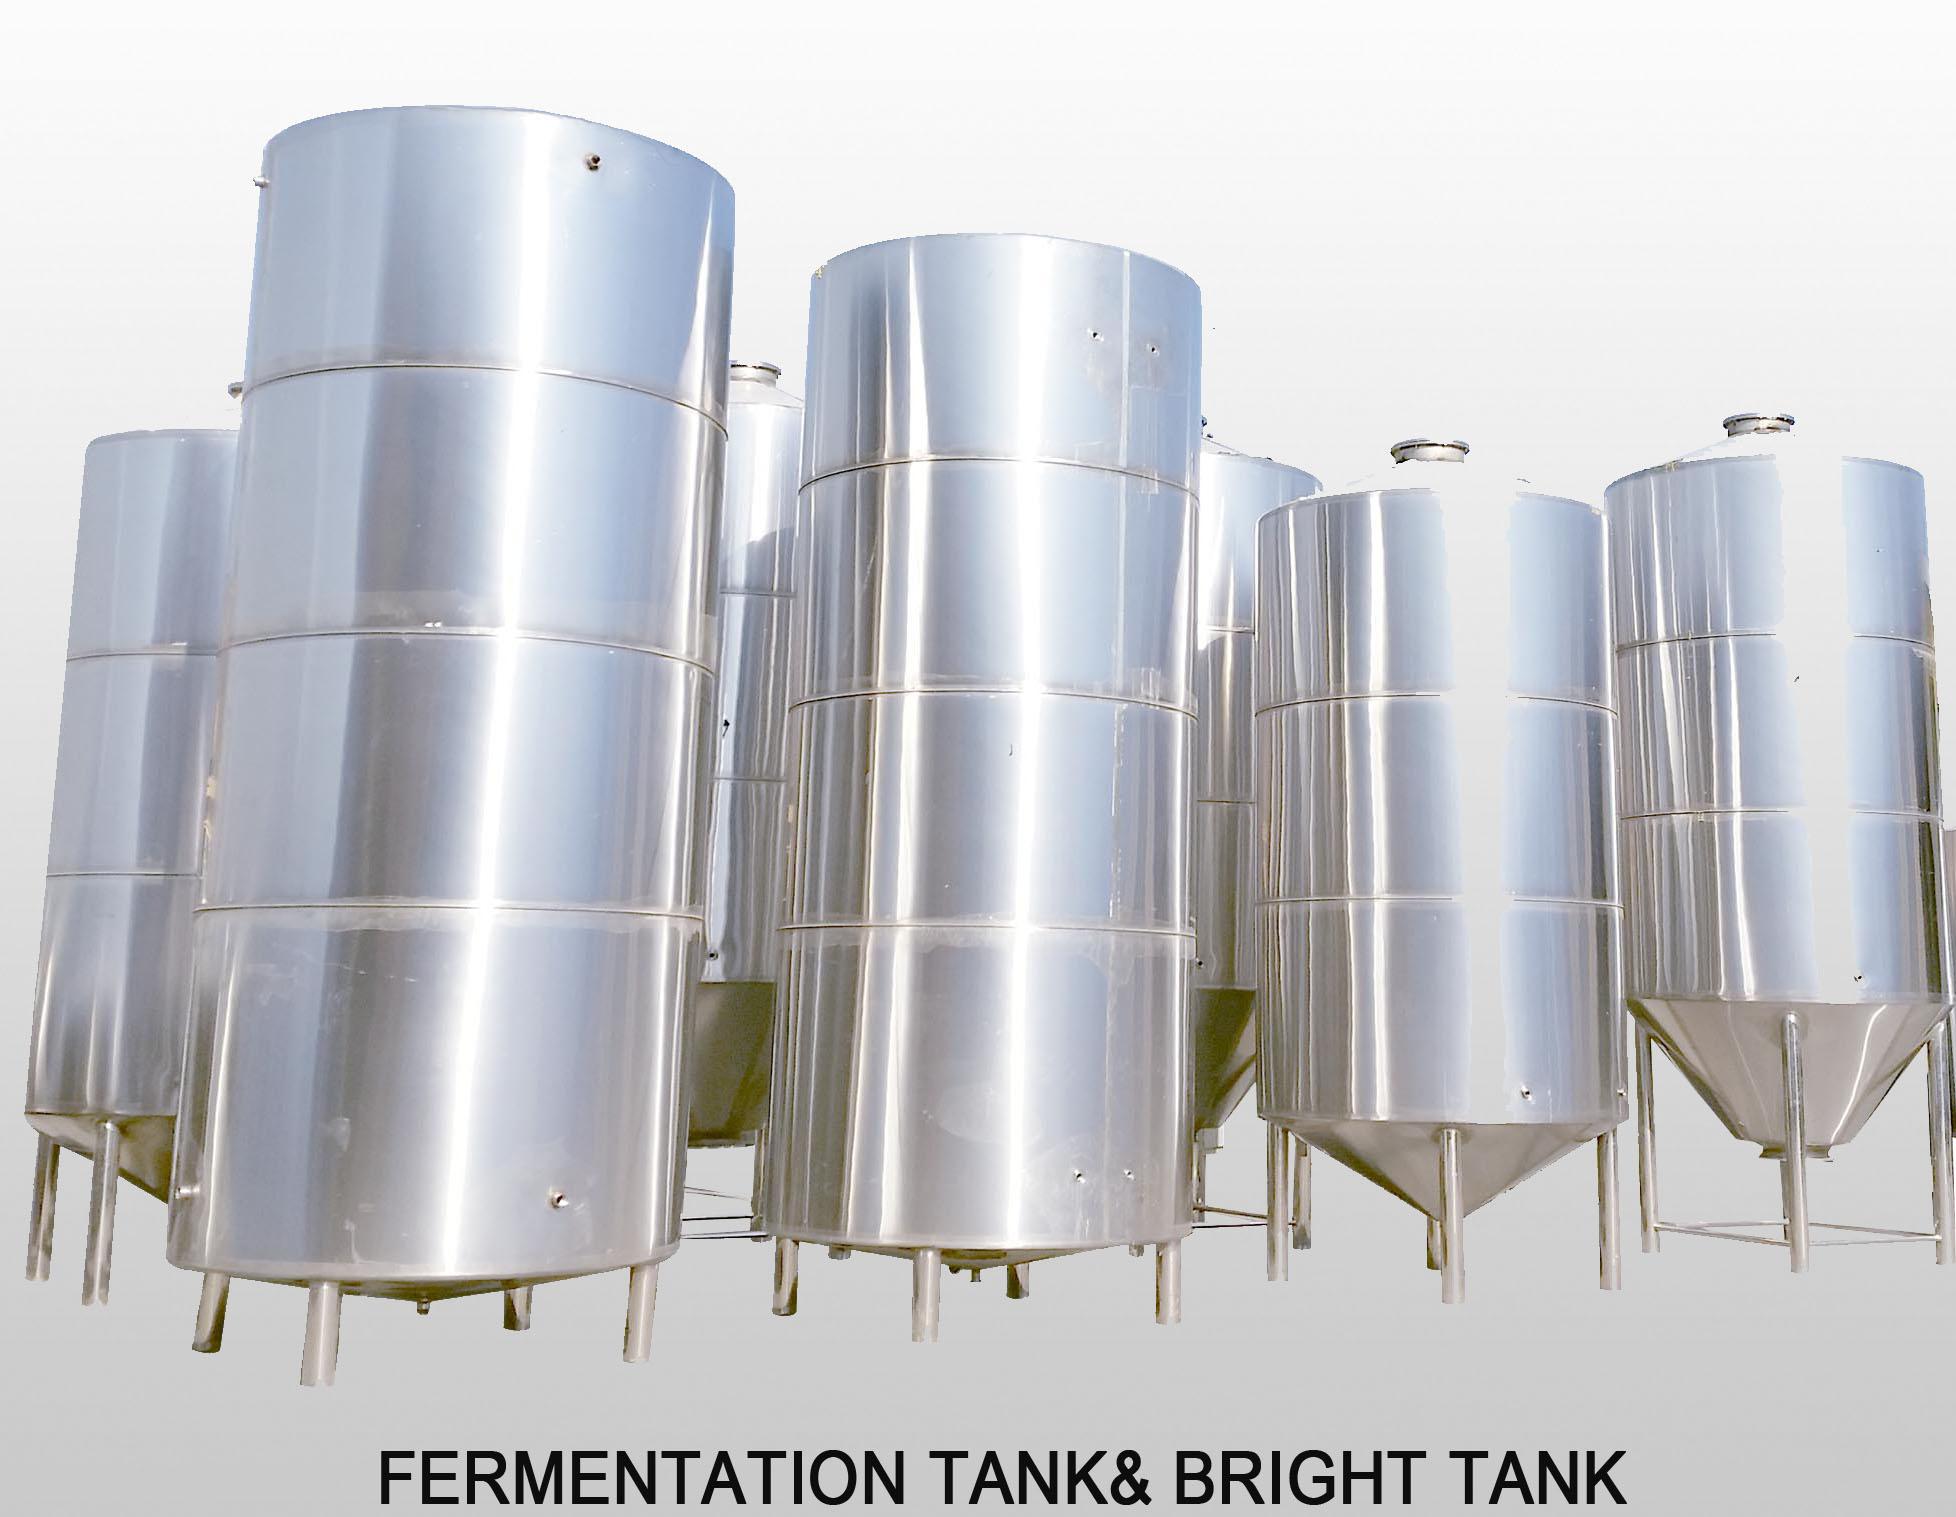 Fermentation Tank& Bright Tank